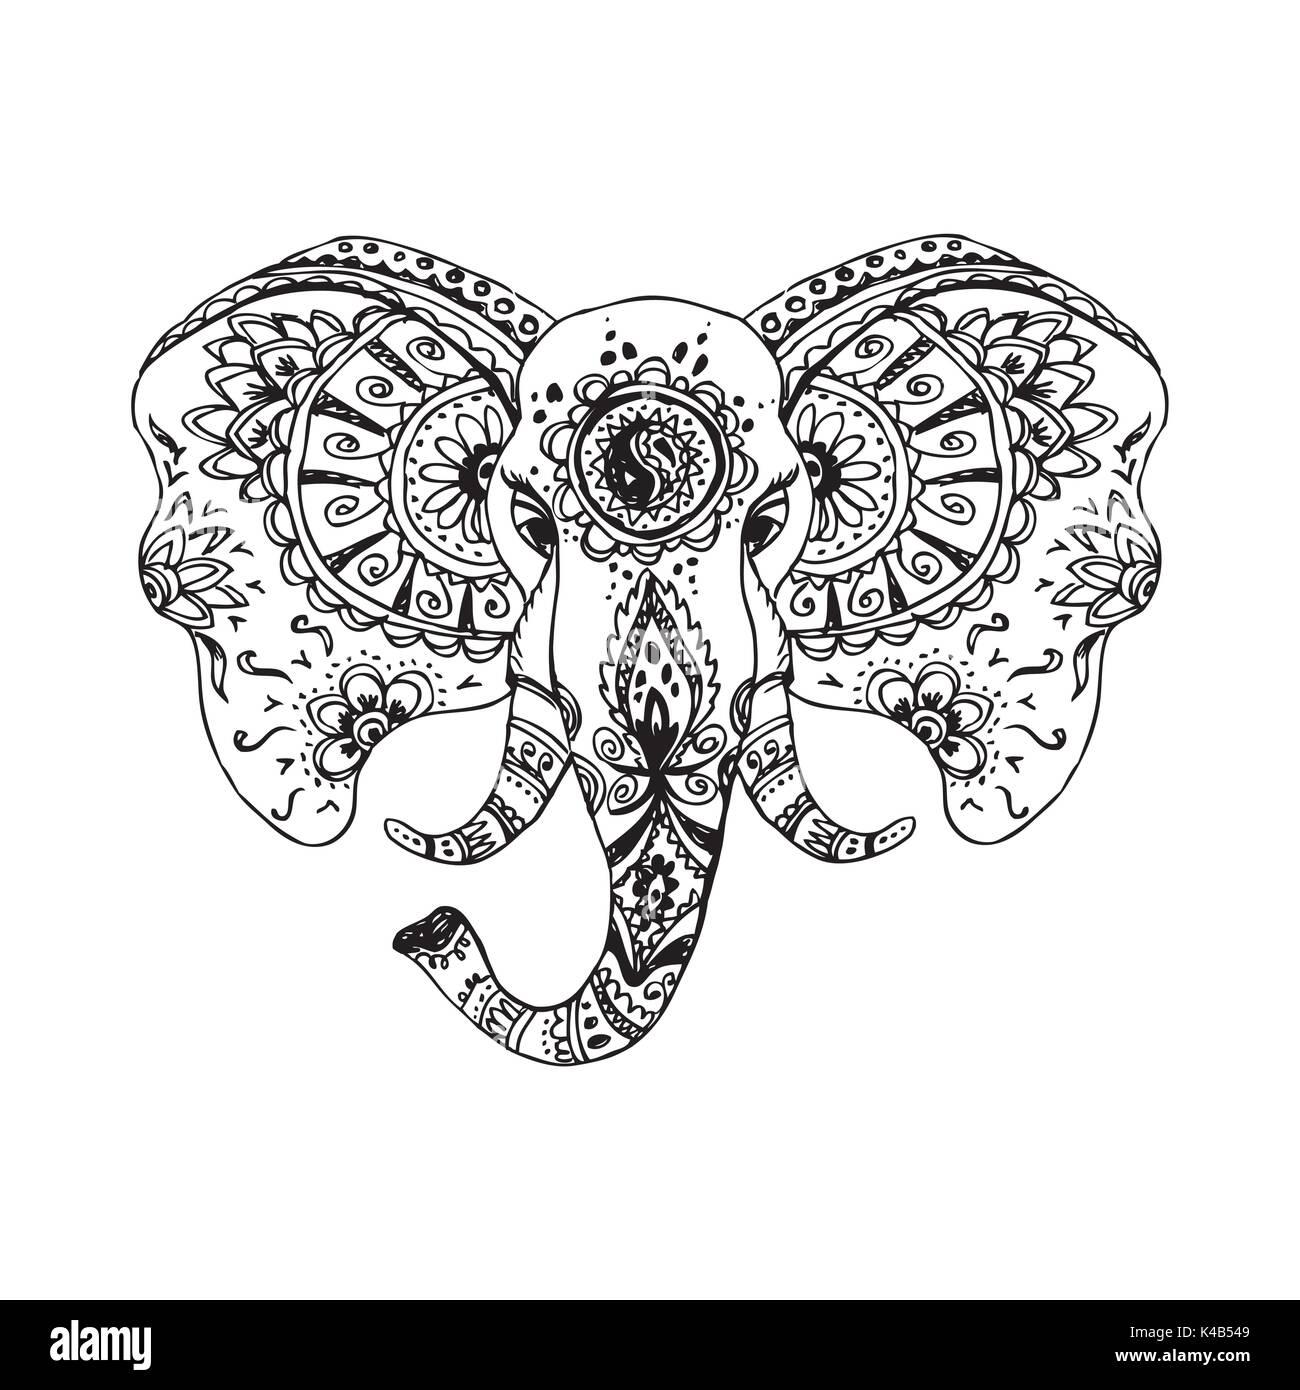 Elephant Indian Style Decorative Vector Imágenes De Stock Elephant